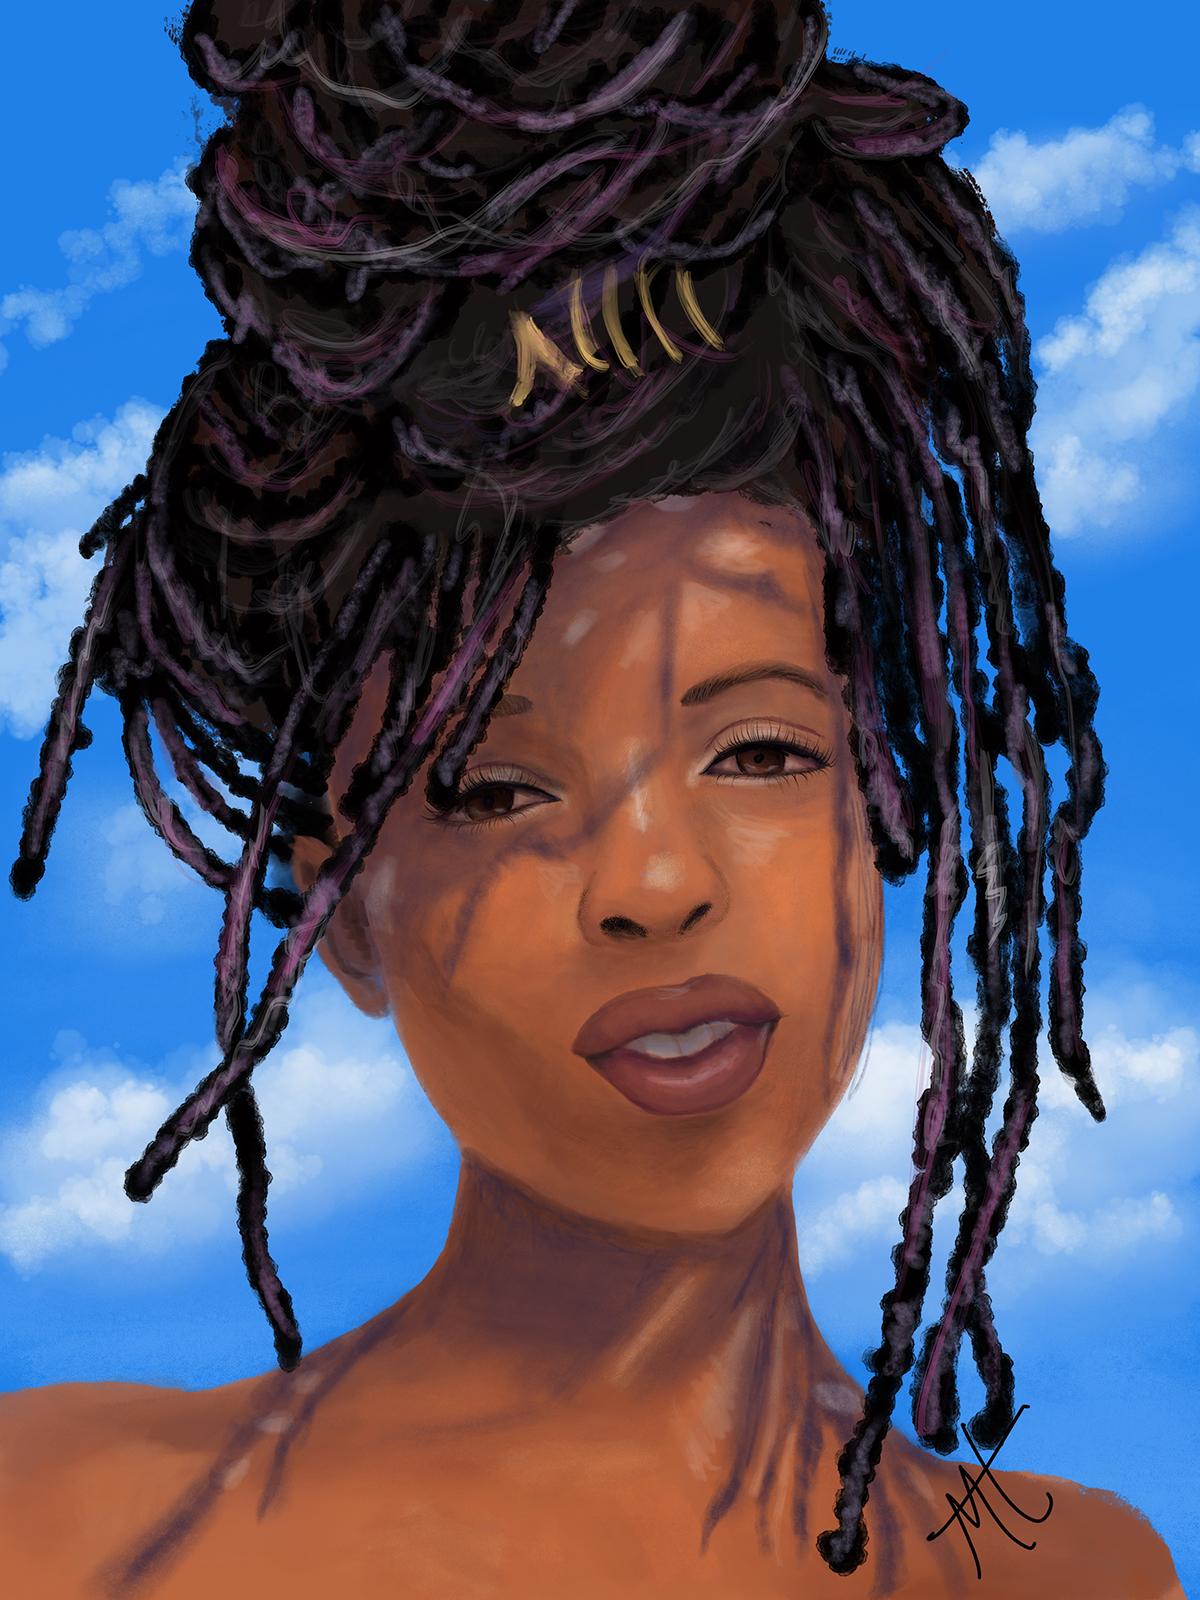 Digital portrait art